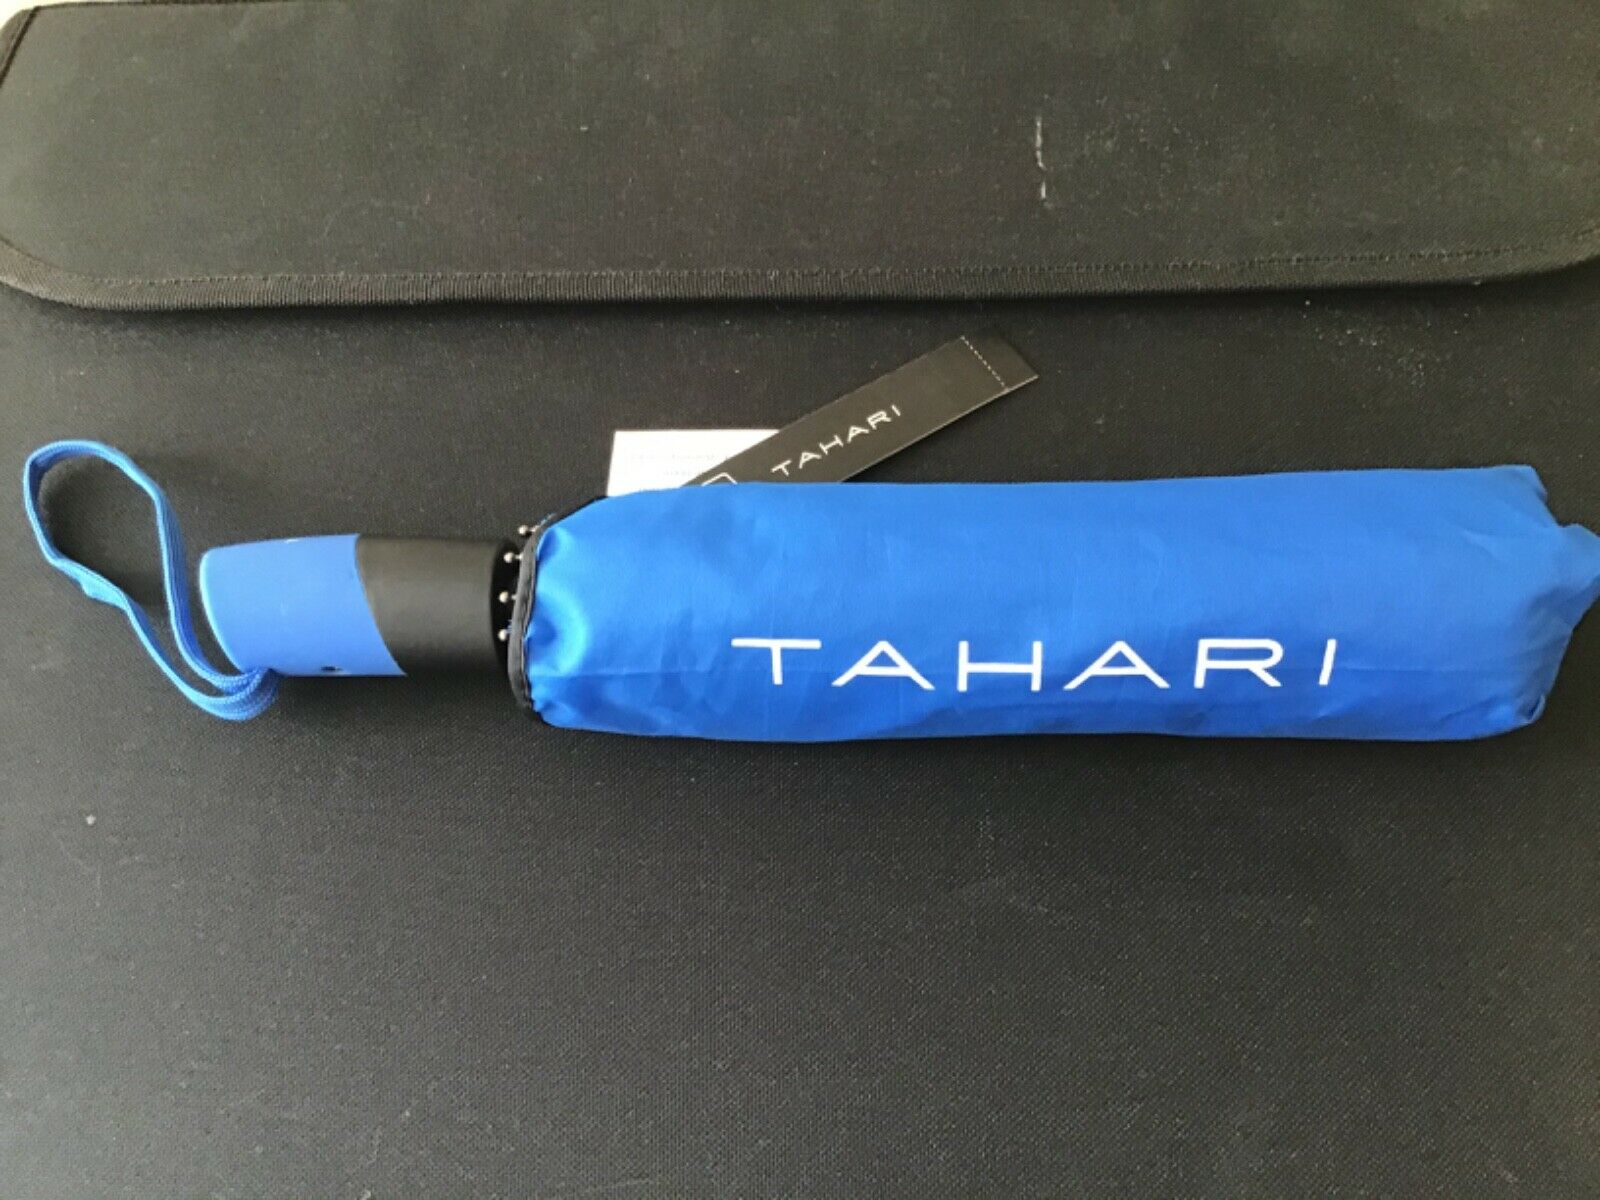 TAHARI UMBRELLA WITH COVER BLUE AUTO OPEN CLOSE RETAIL- 48 NWT